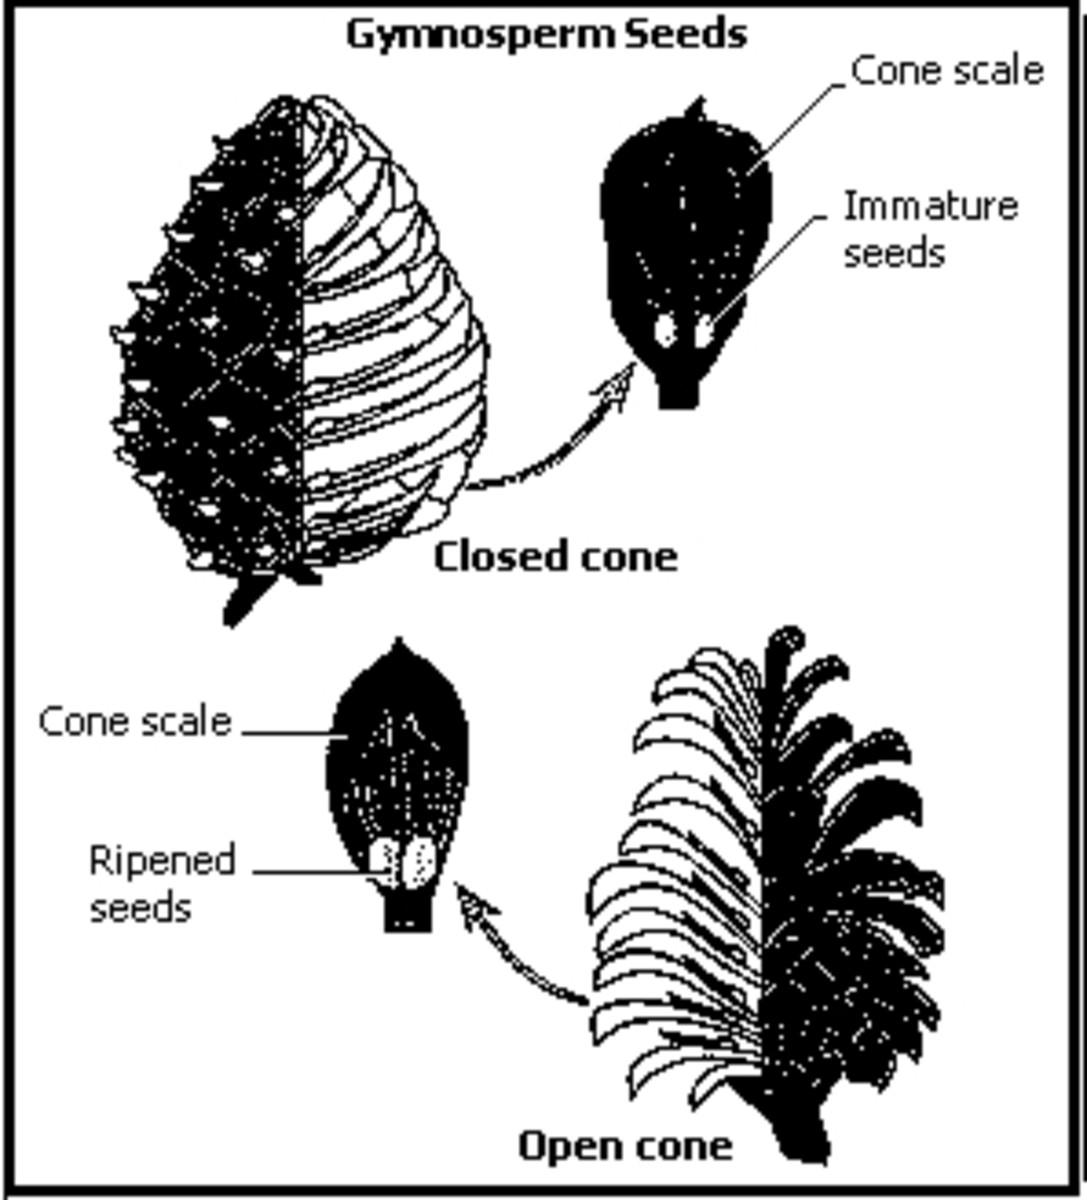 Gymnosperm parts